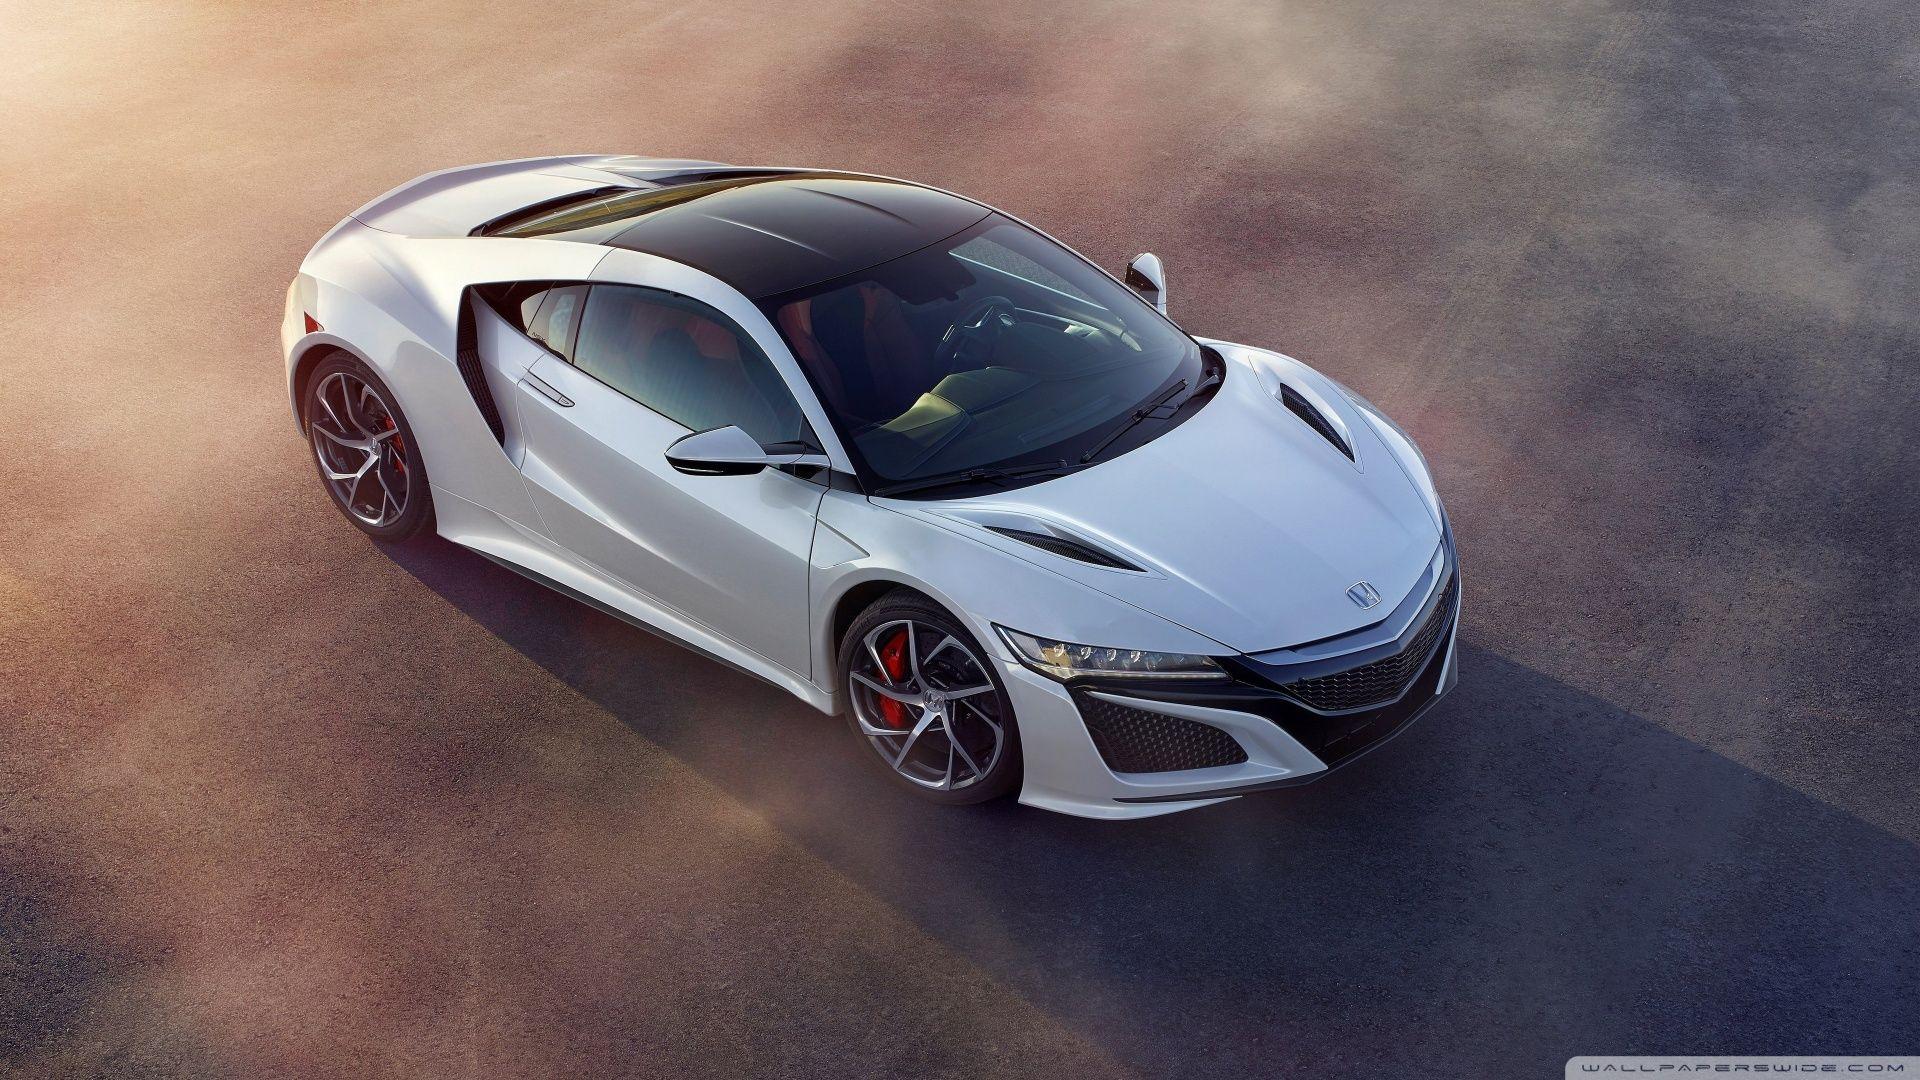 Acura Nsx Nsx Luxury Hybrid Cars New Luxury Cars